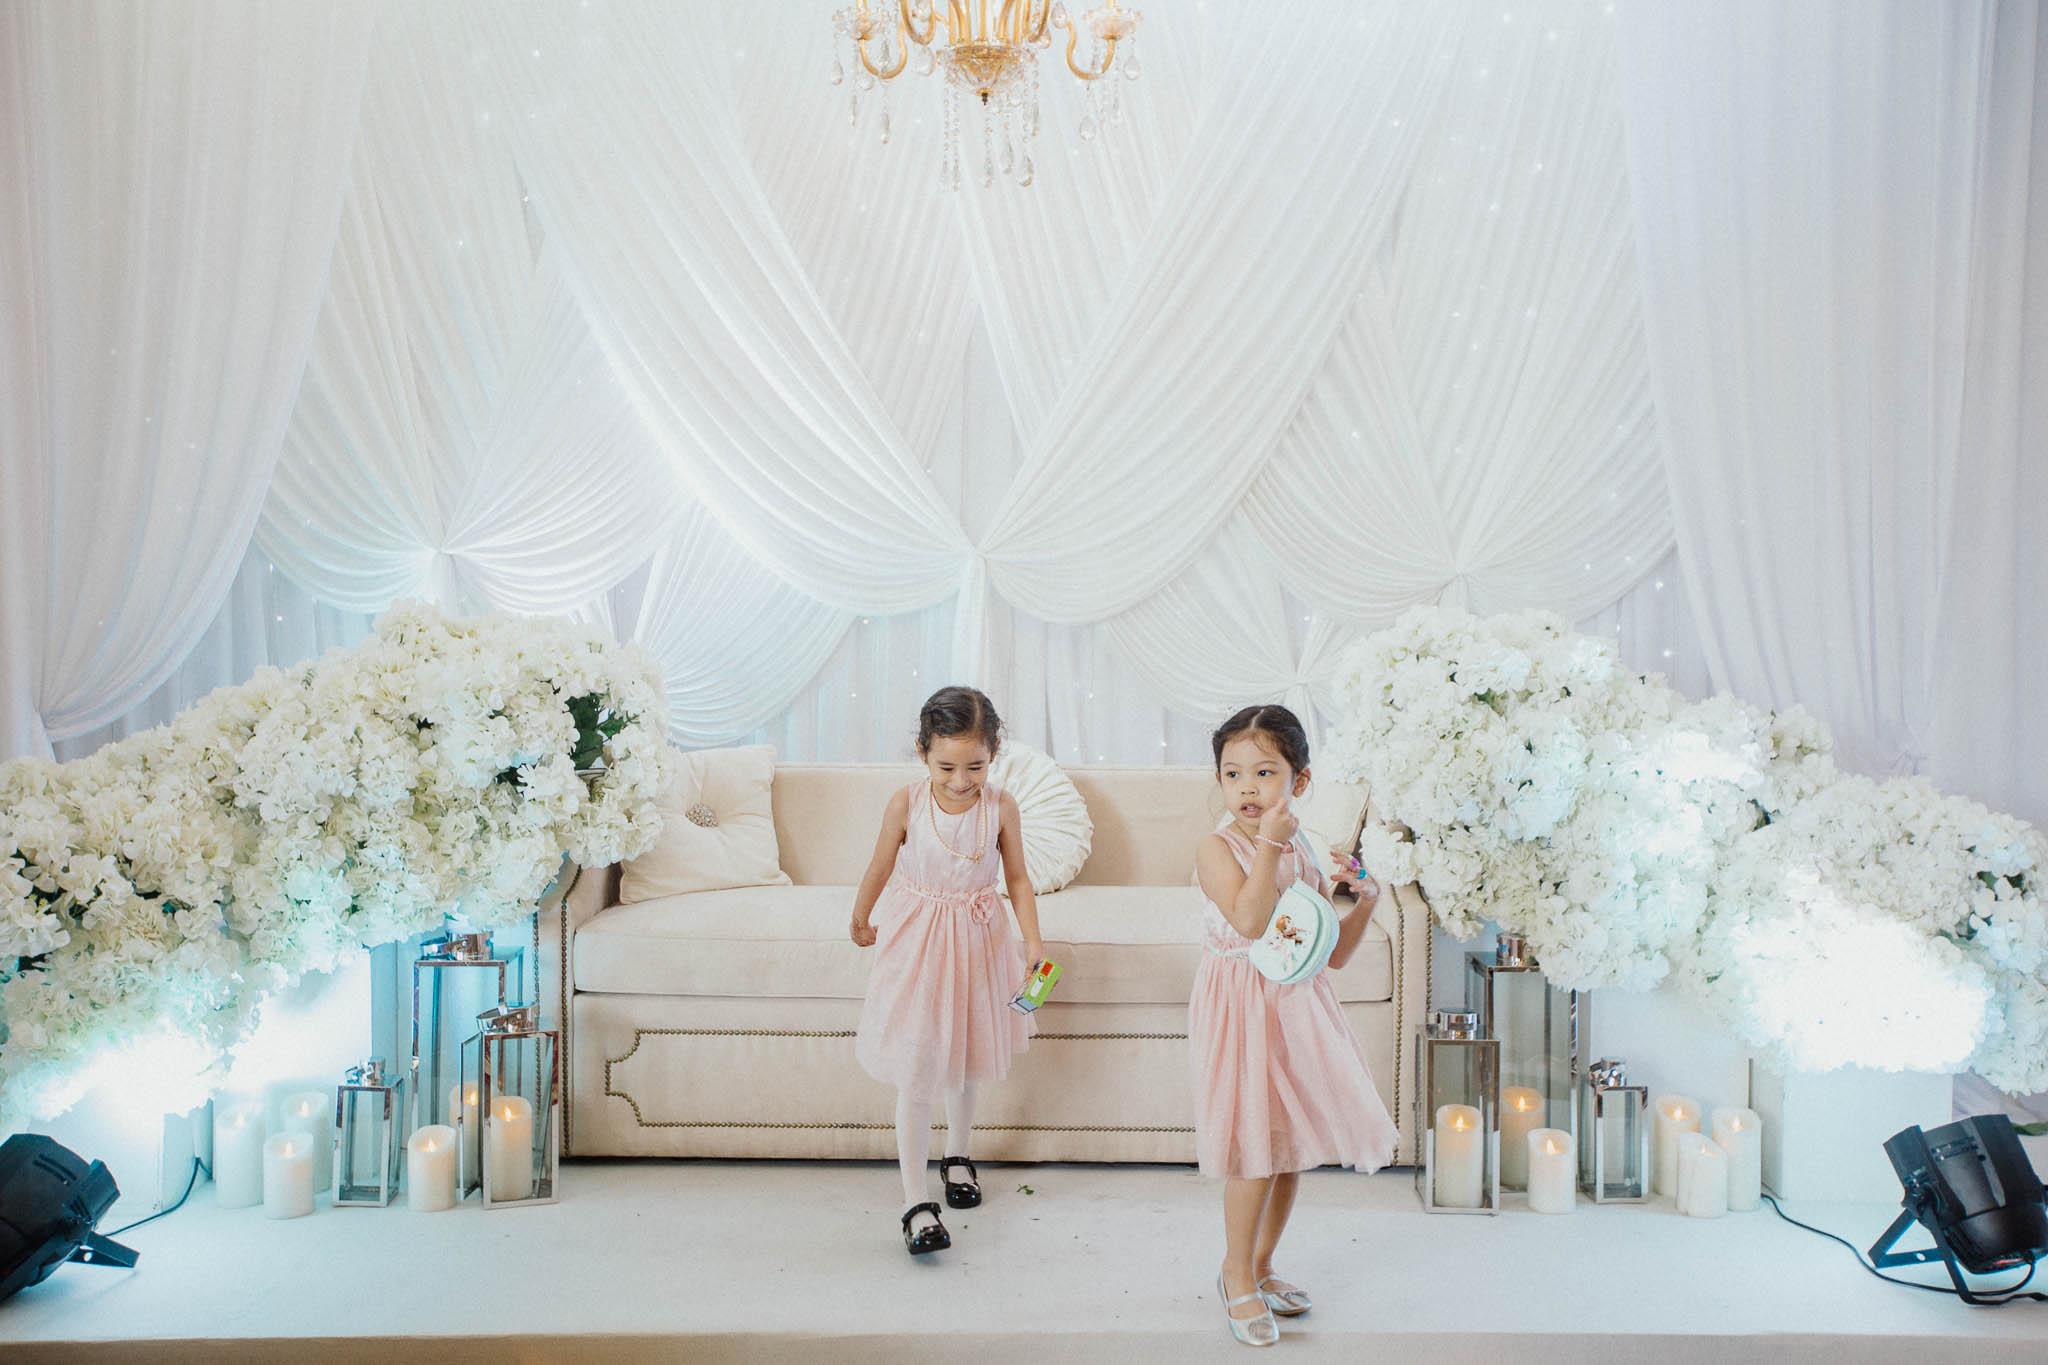 singapore-wedding-photographer-addafiq-nufail-038.jpg